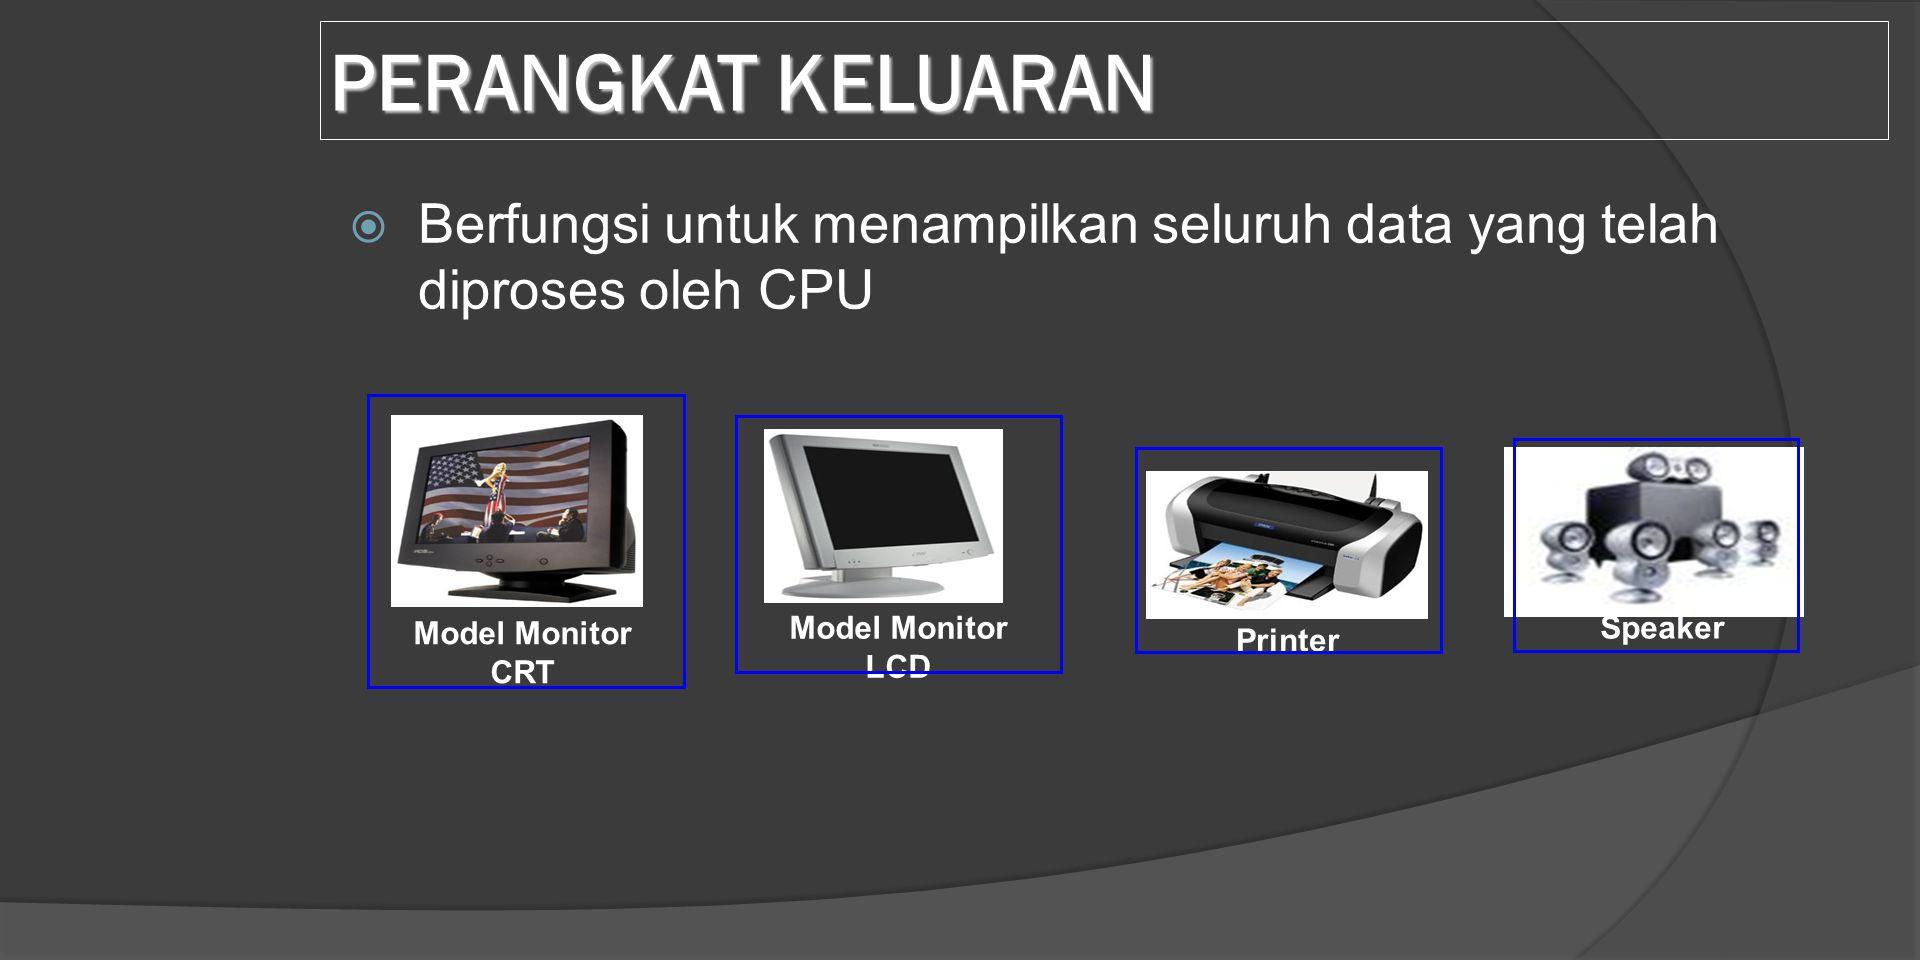 PERANGKAT KELUARAN Berfungsi untuk menampilkan seluruh data yang telah diproses oleh CPU. Model Monitor CRT.